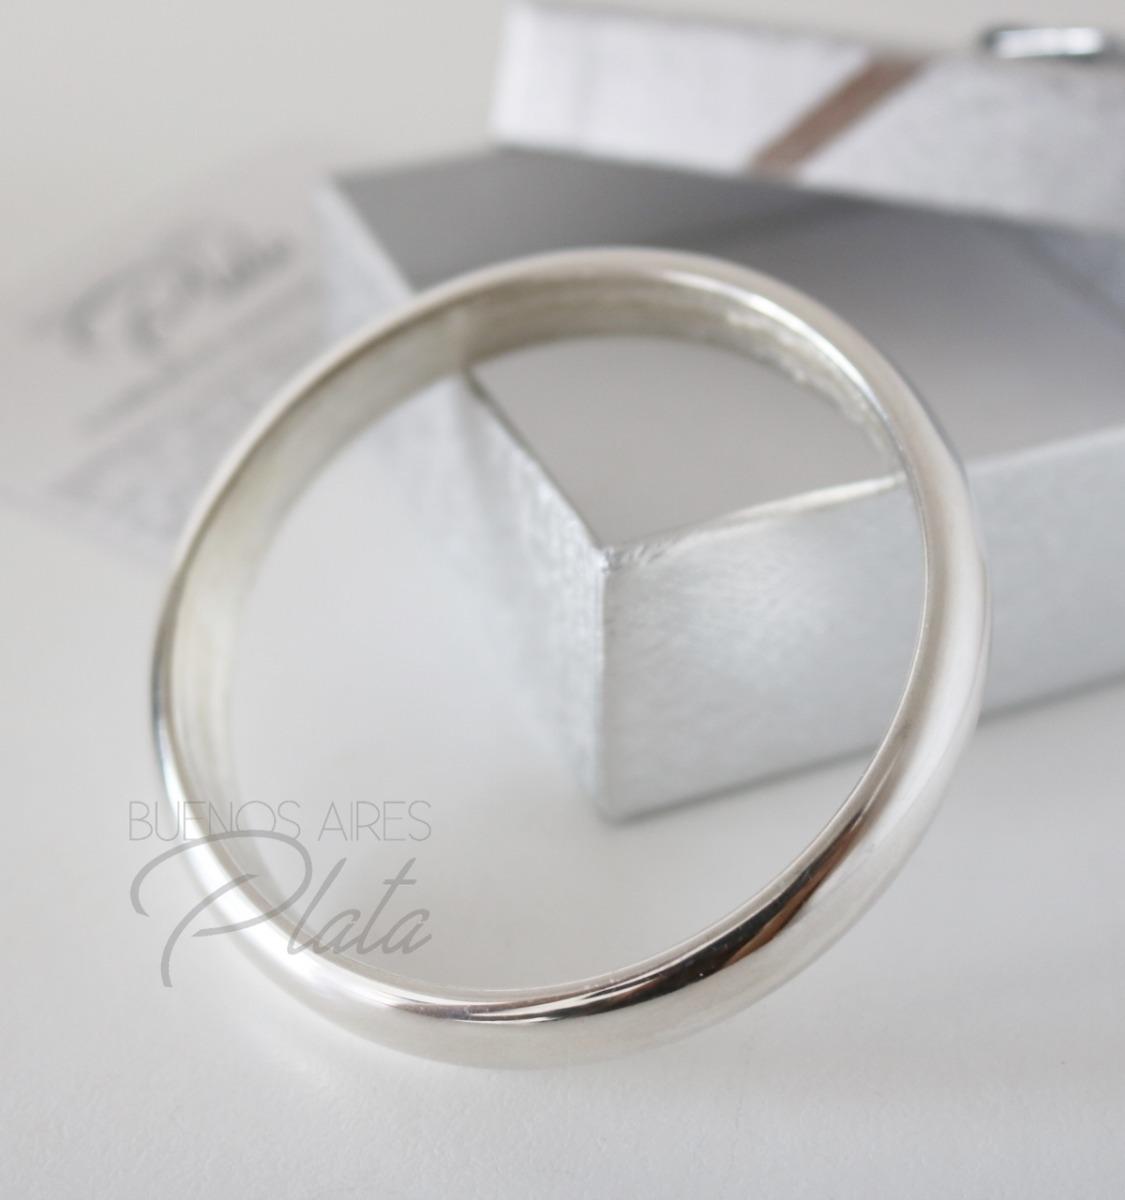 610fdae901f8 pulsera esclava plata 925 11 mm gruesa garantía escrita. Cargando zoom.